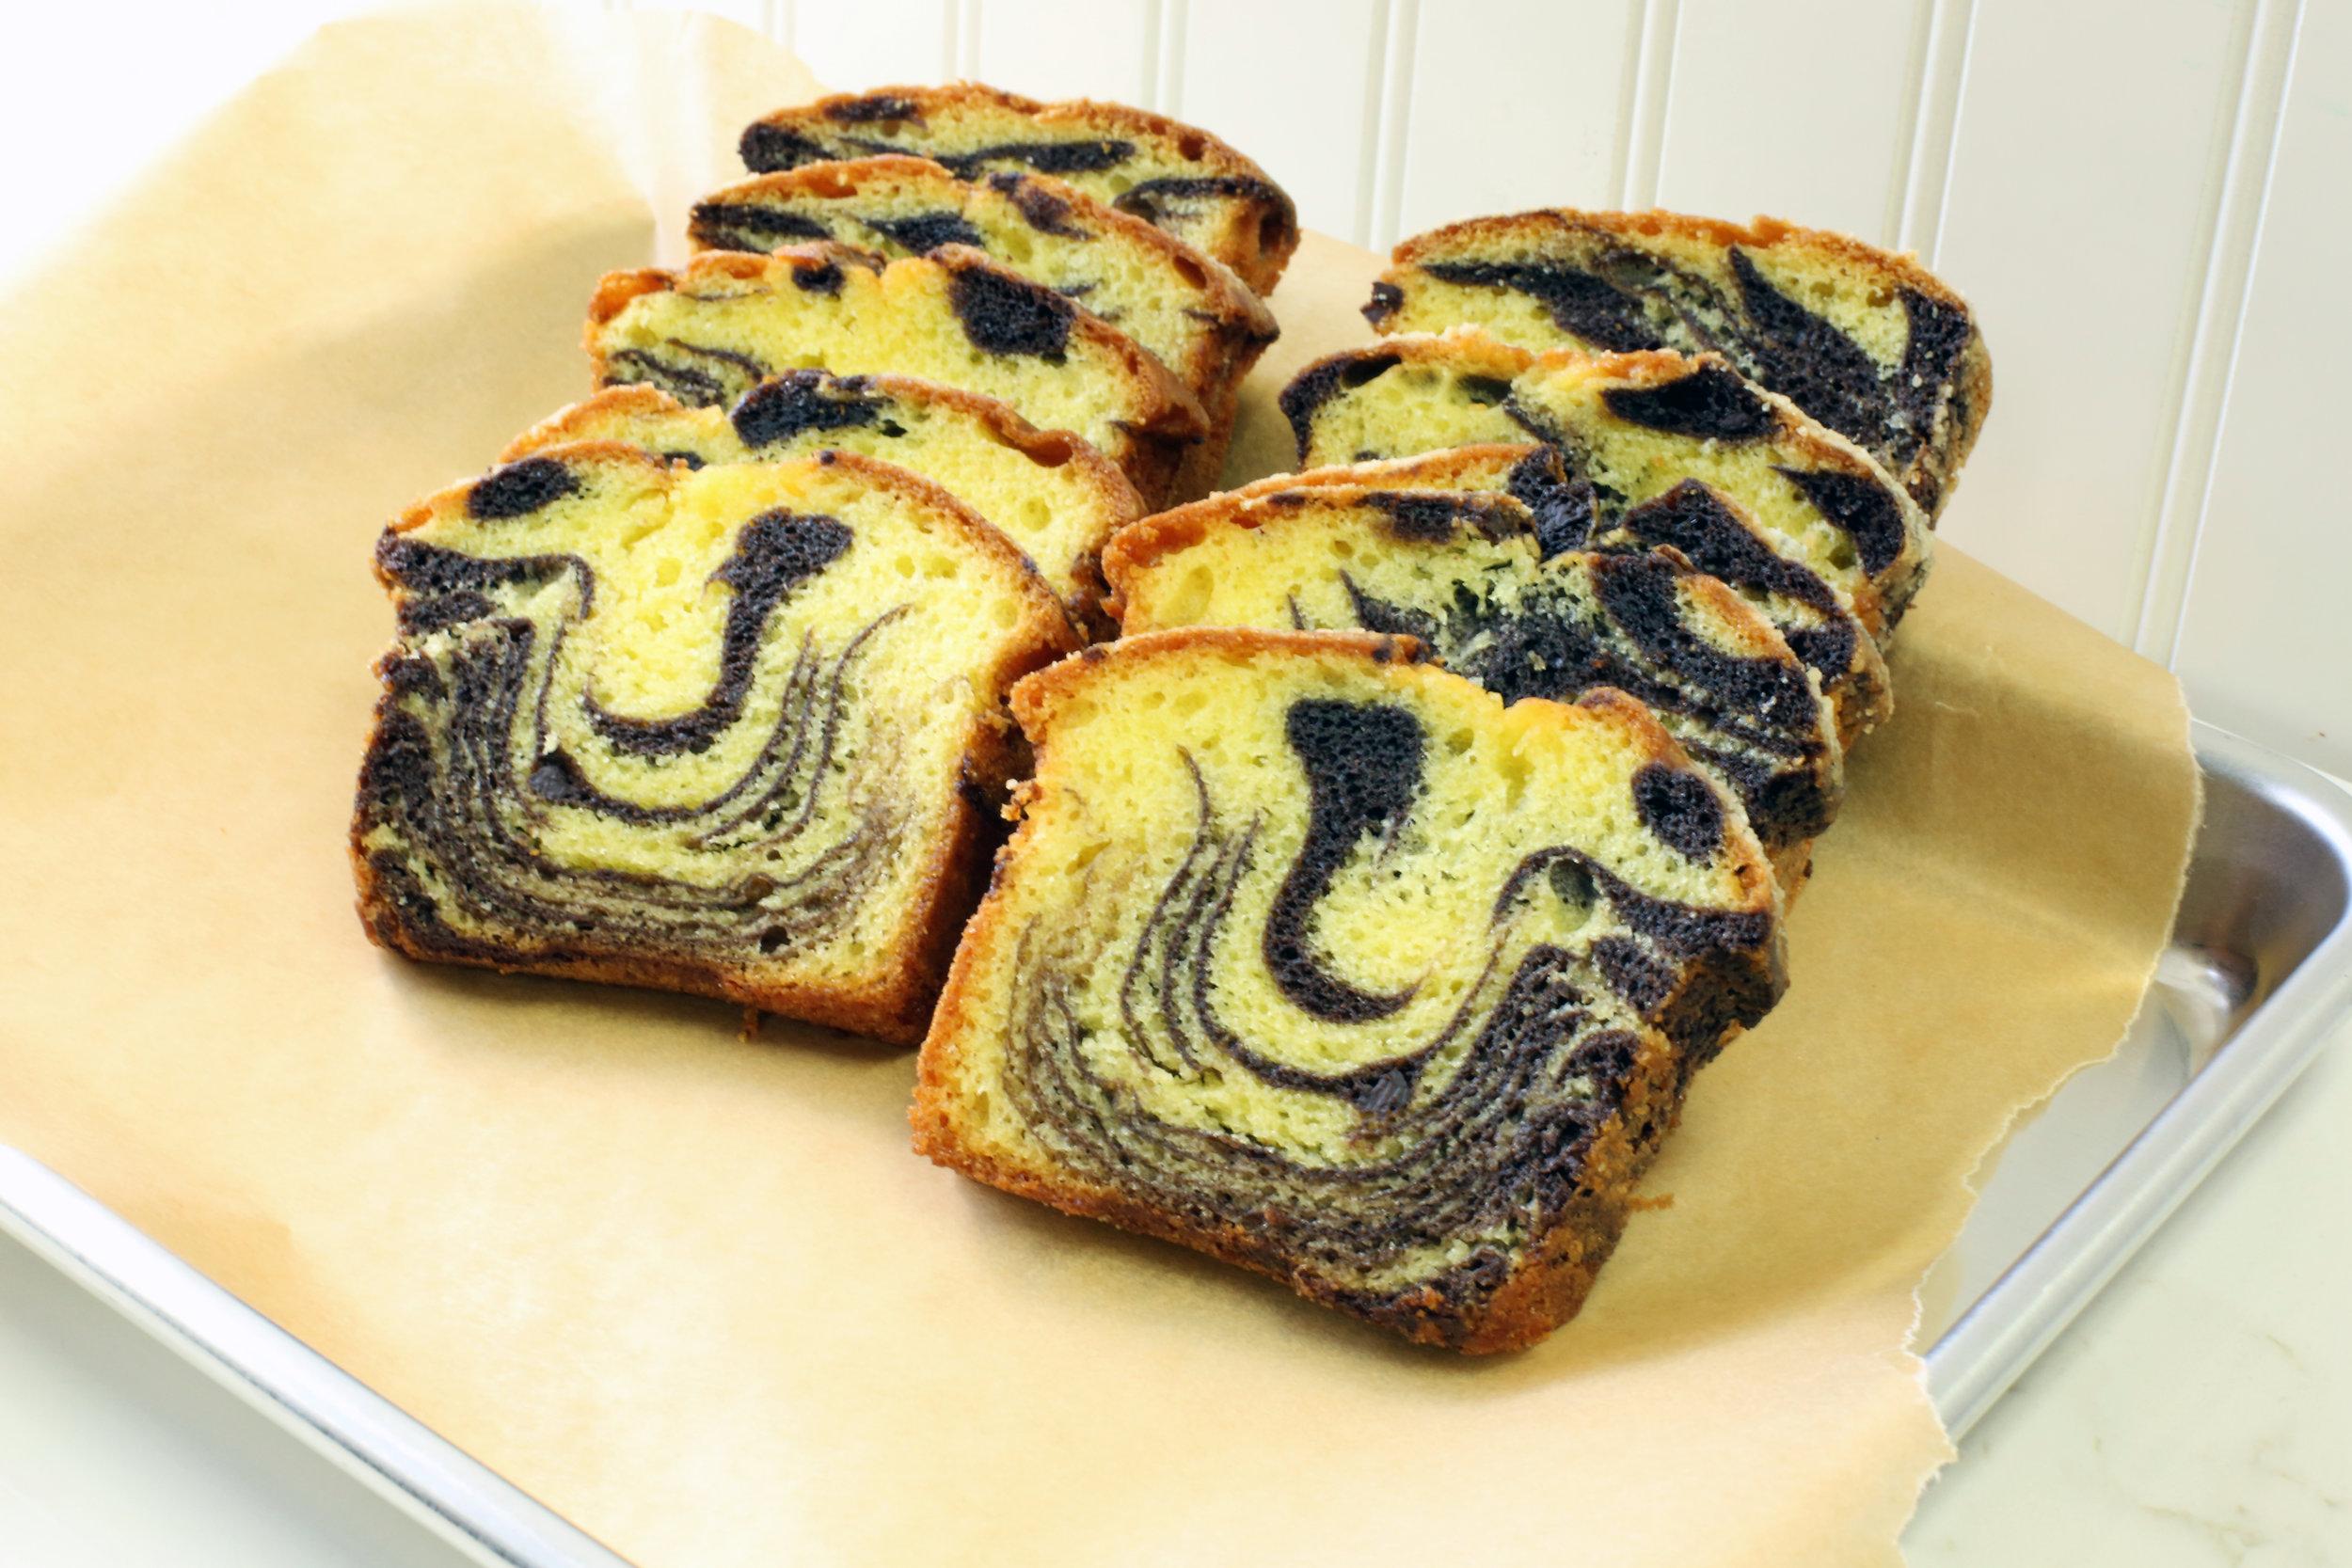 Mrs. Wonderful's Cakes™ - Marble Swirl Sliced Loaf Cake